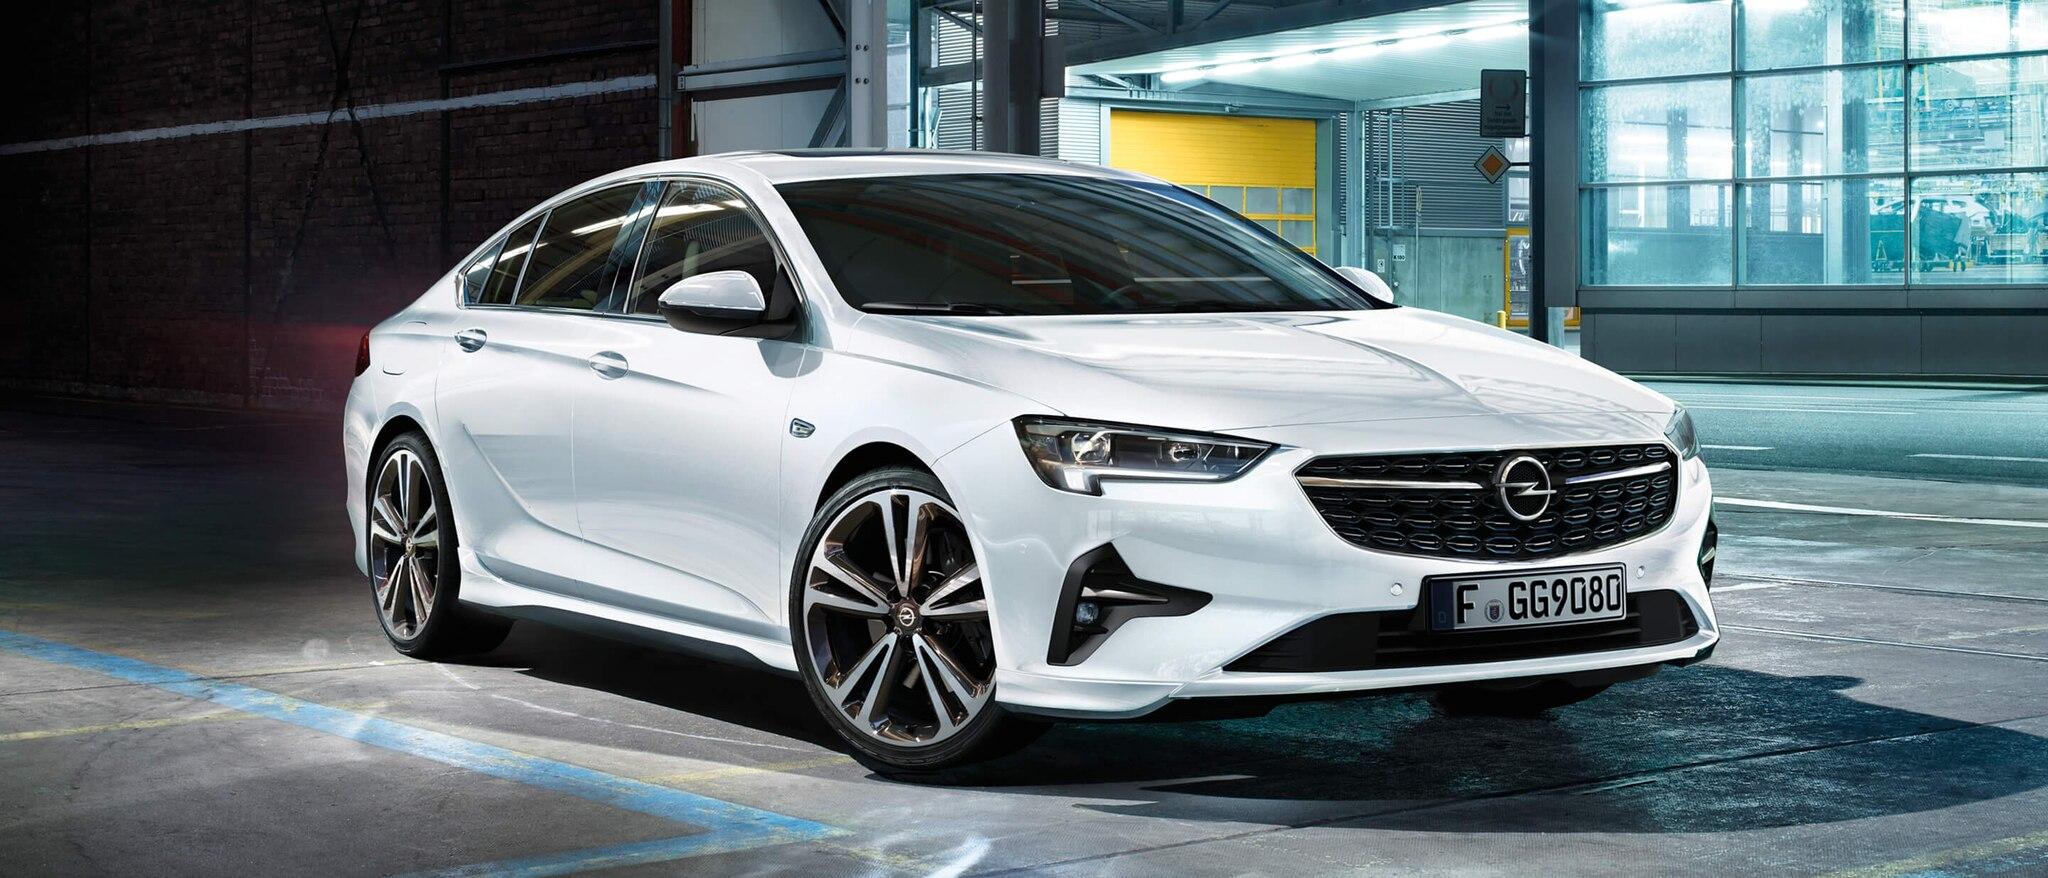 Opel Insignia Grand Sport Torino